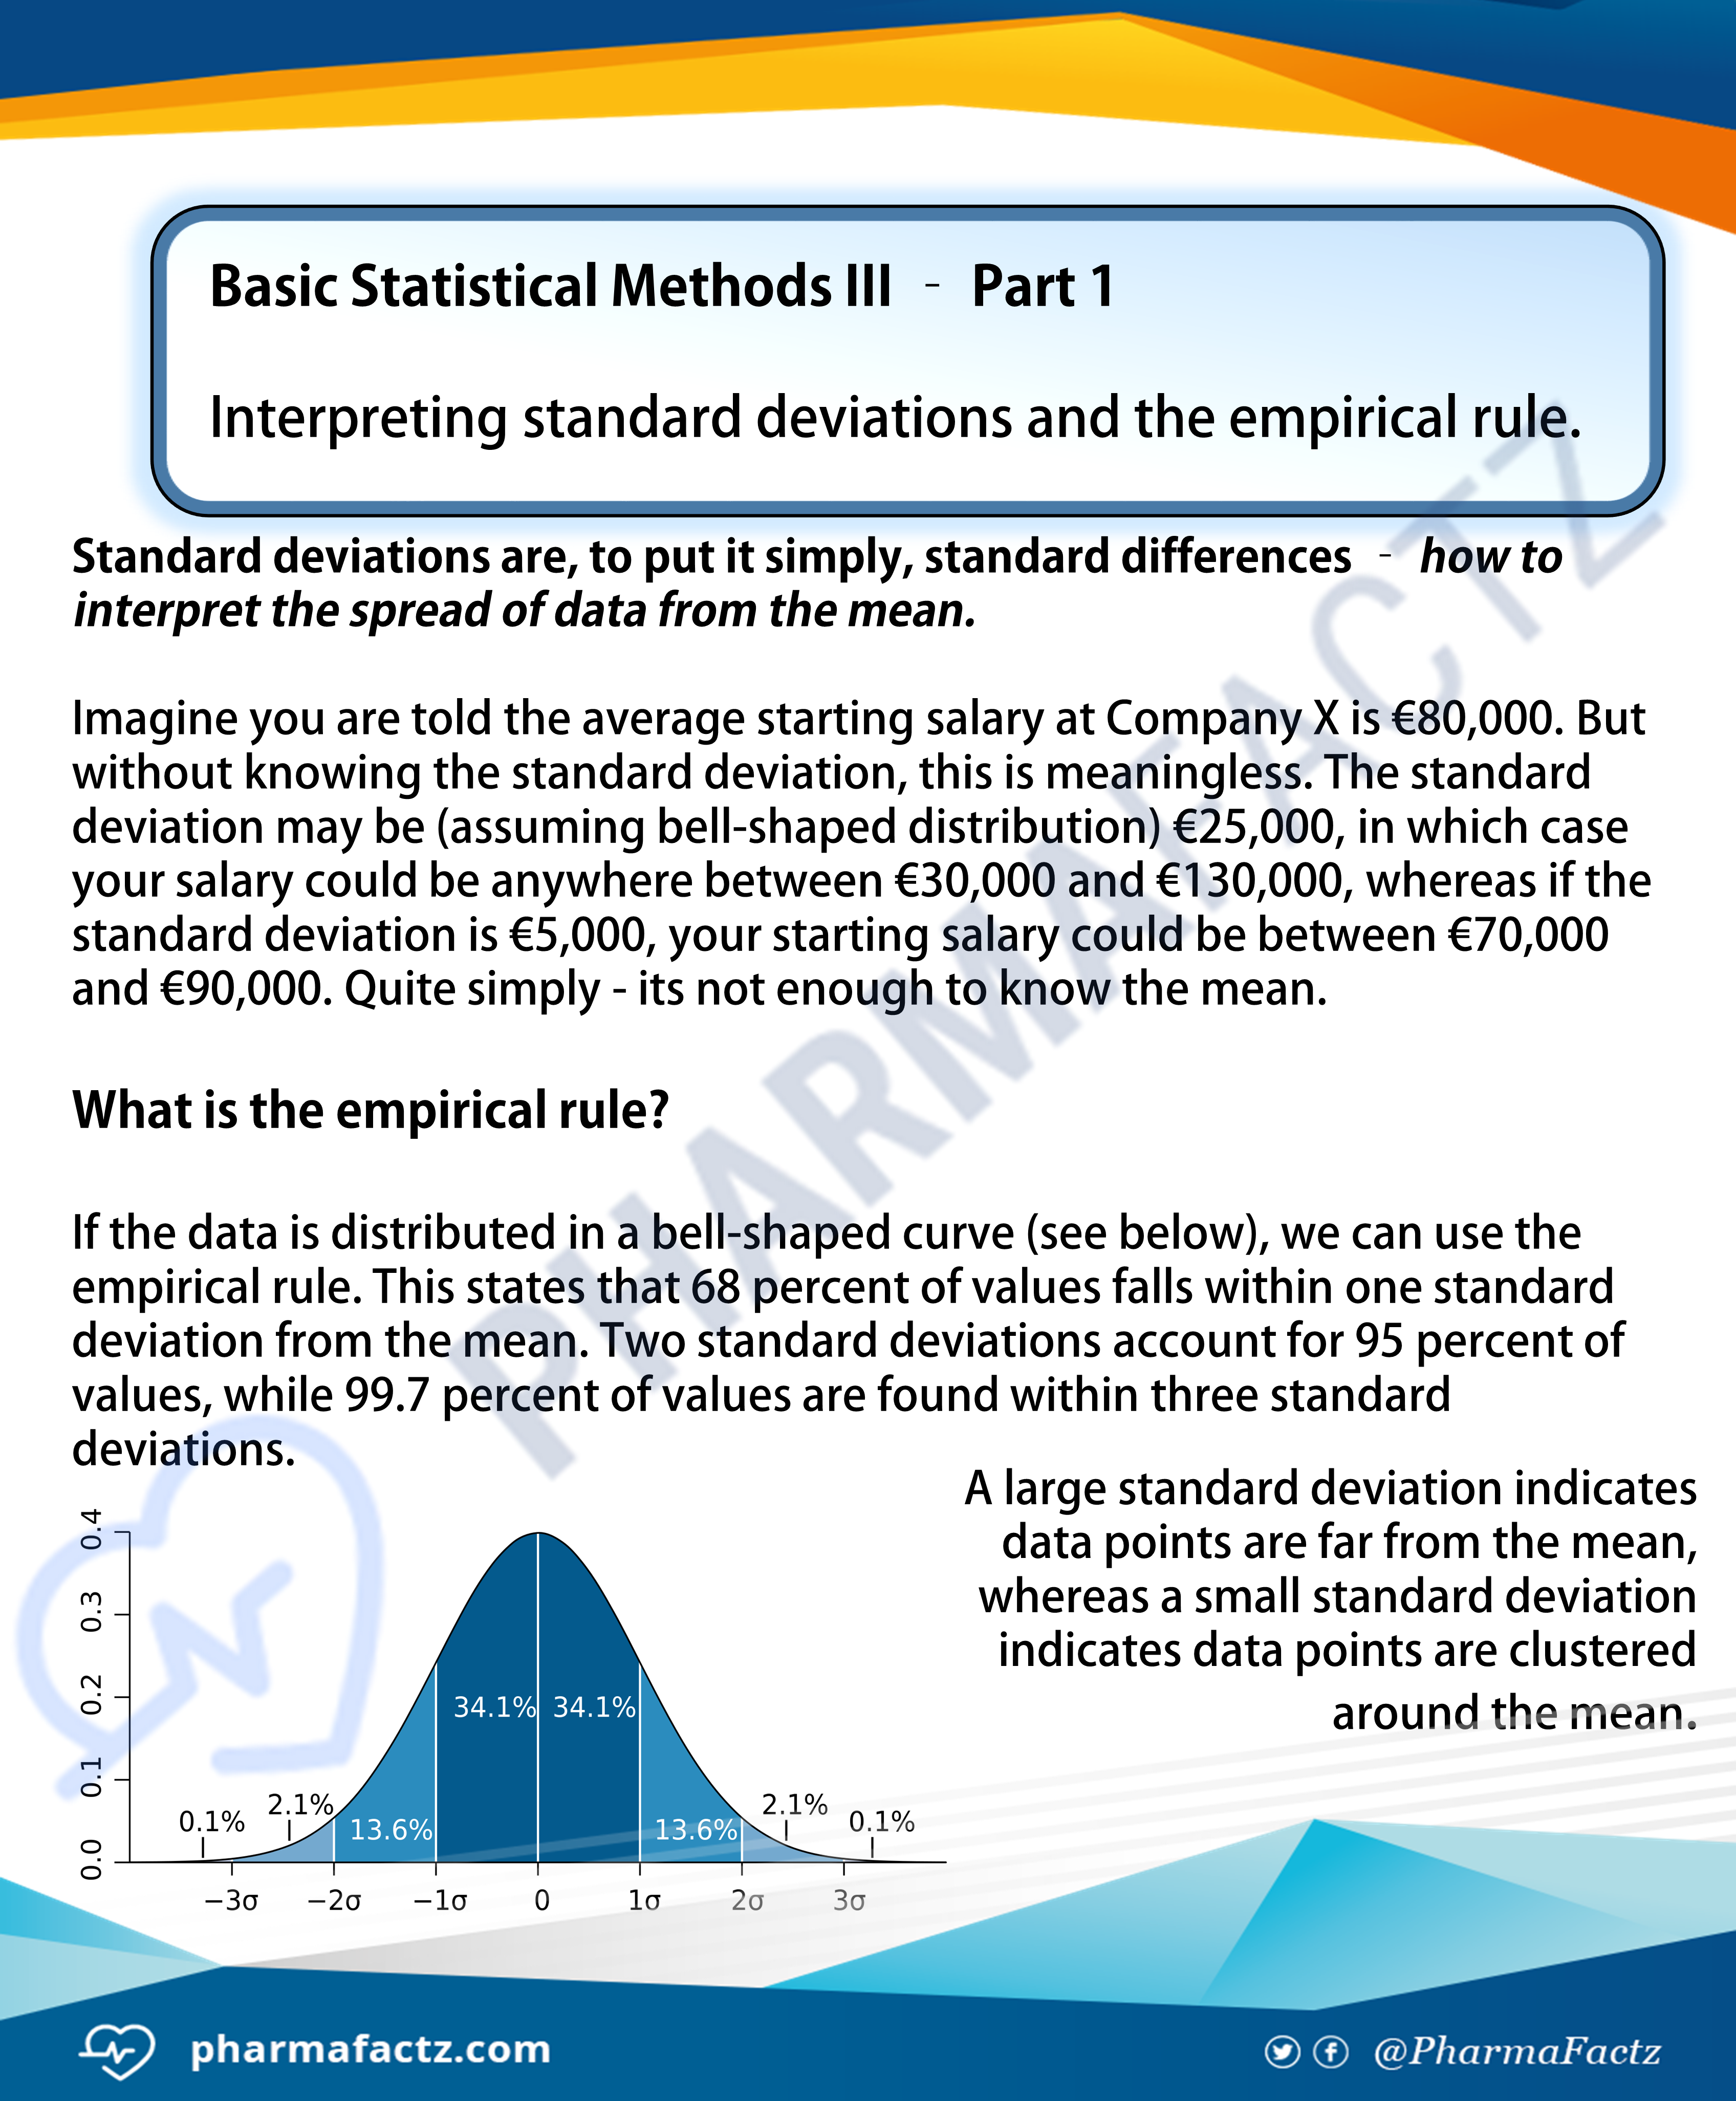 Basic Statistical Methods 3 (Part 1)